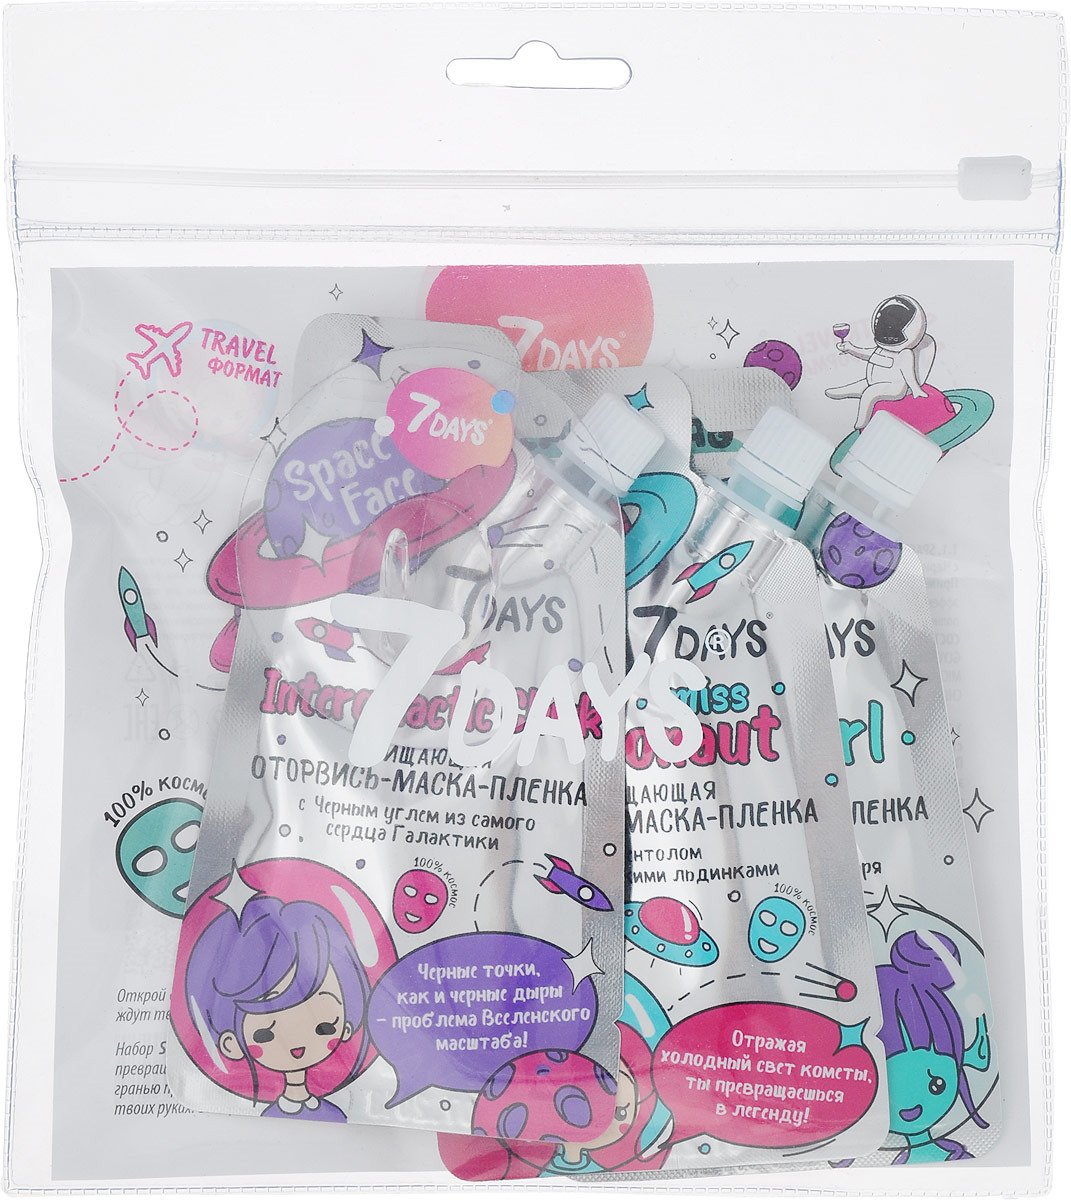 Набор косметики для ухода за кожей 7 Days Beauty Bag Space Face Trio